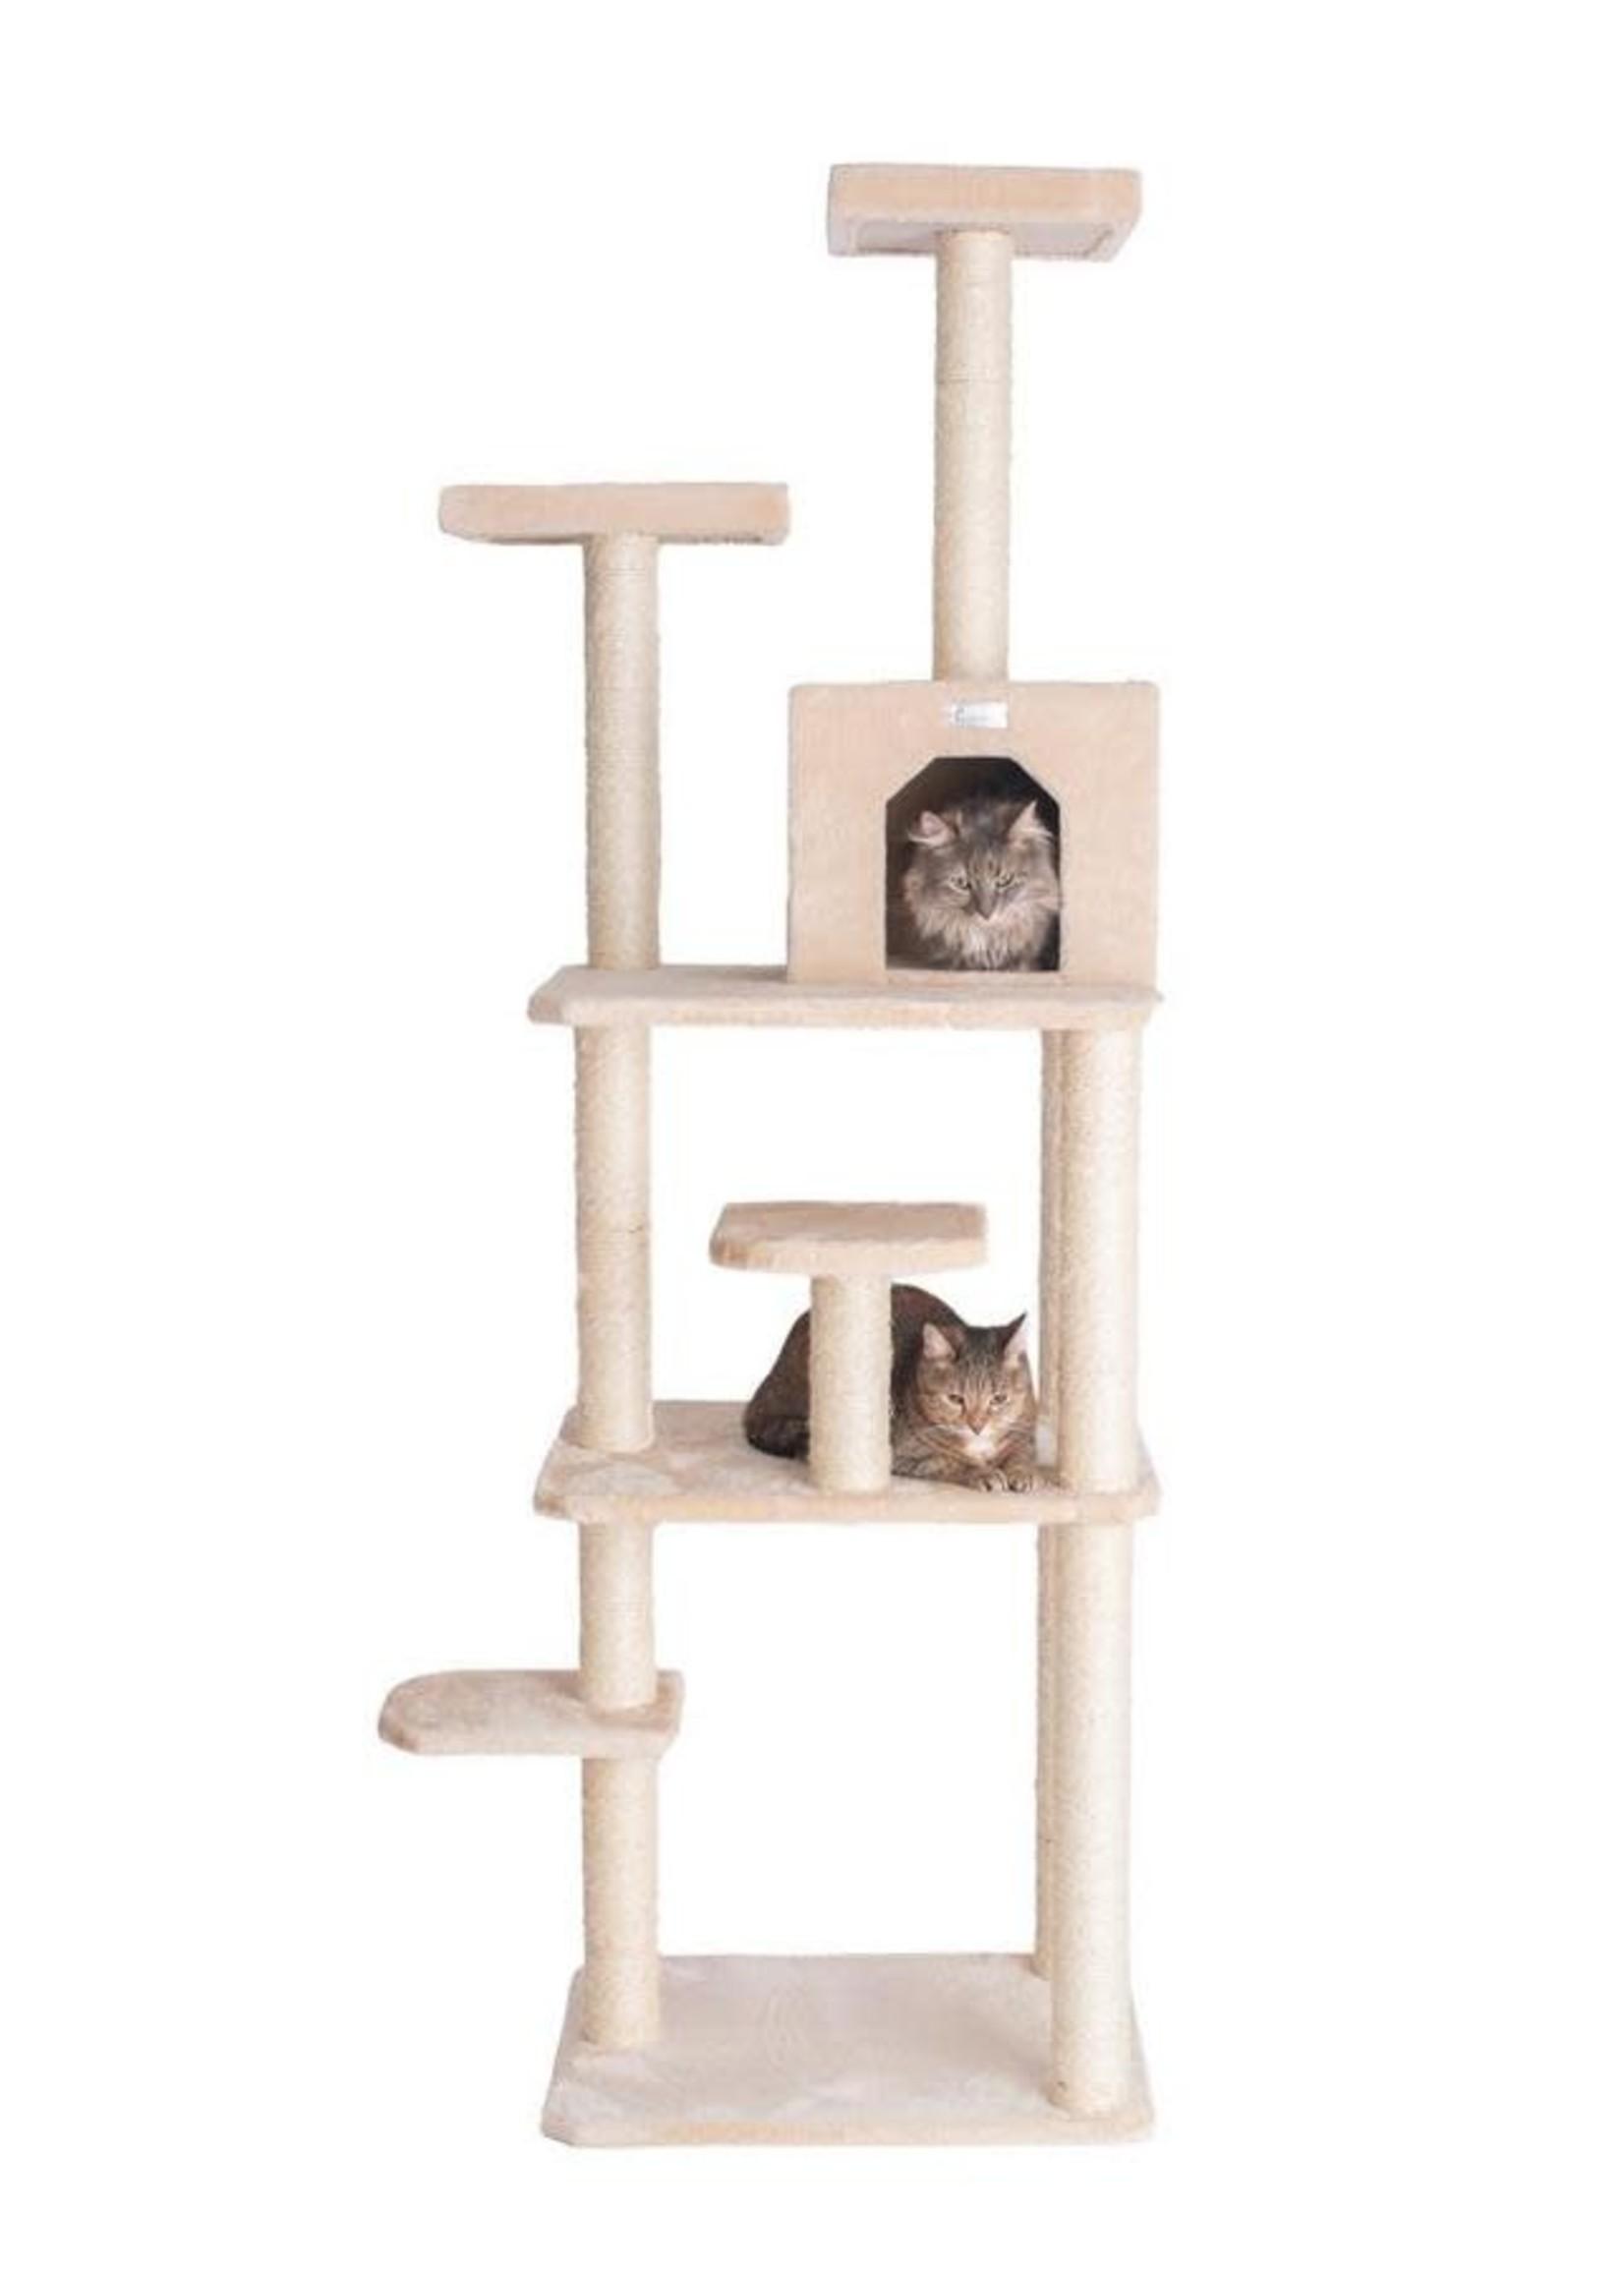 GleePet GleePet GP78740821 74-Inch Cat Tree With Seven Levels, Beige